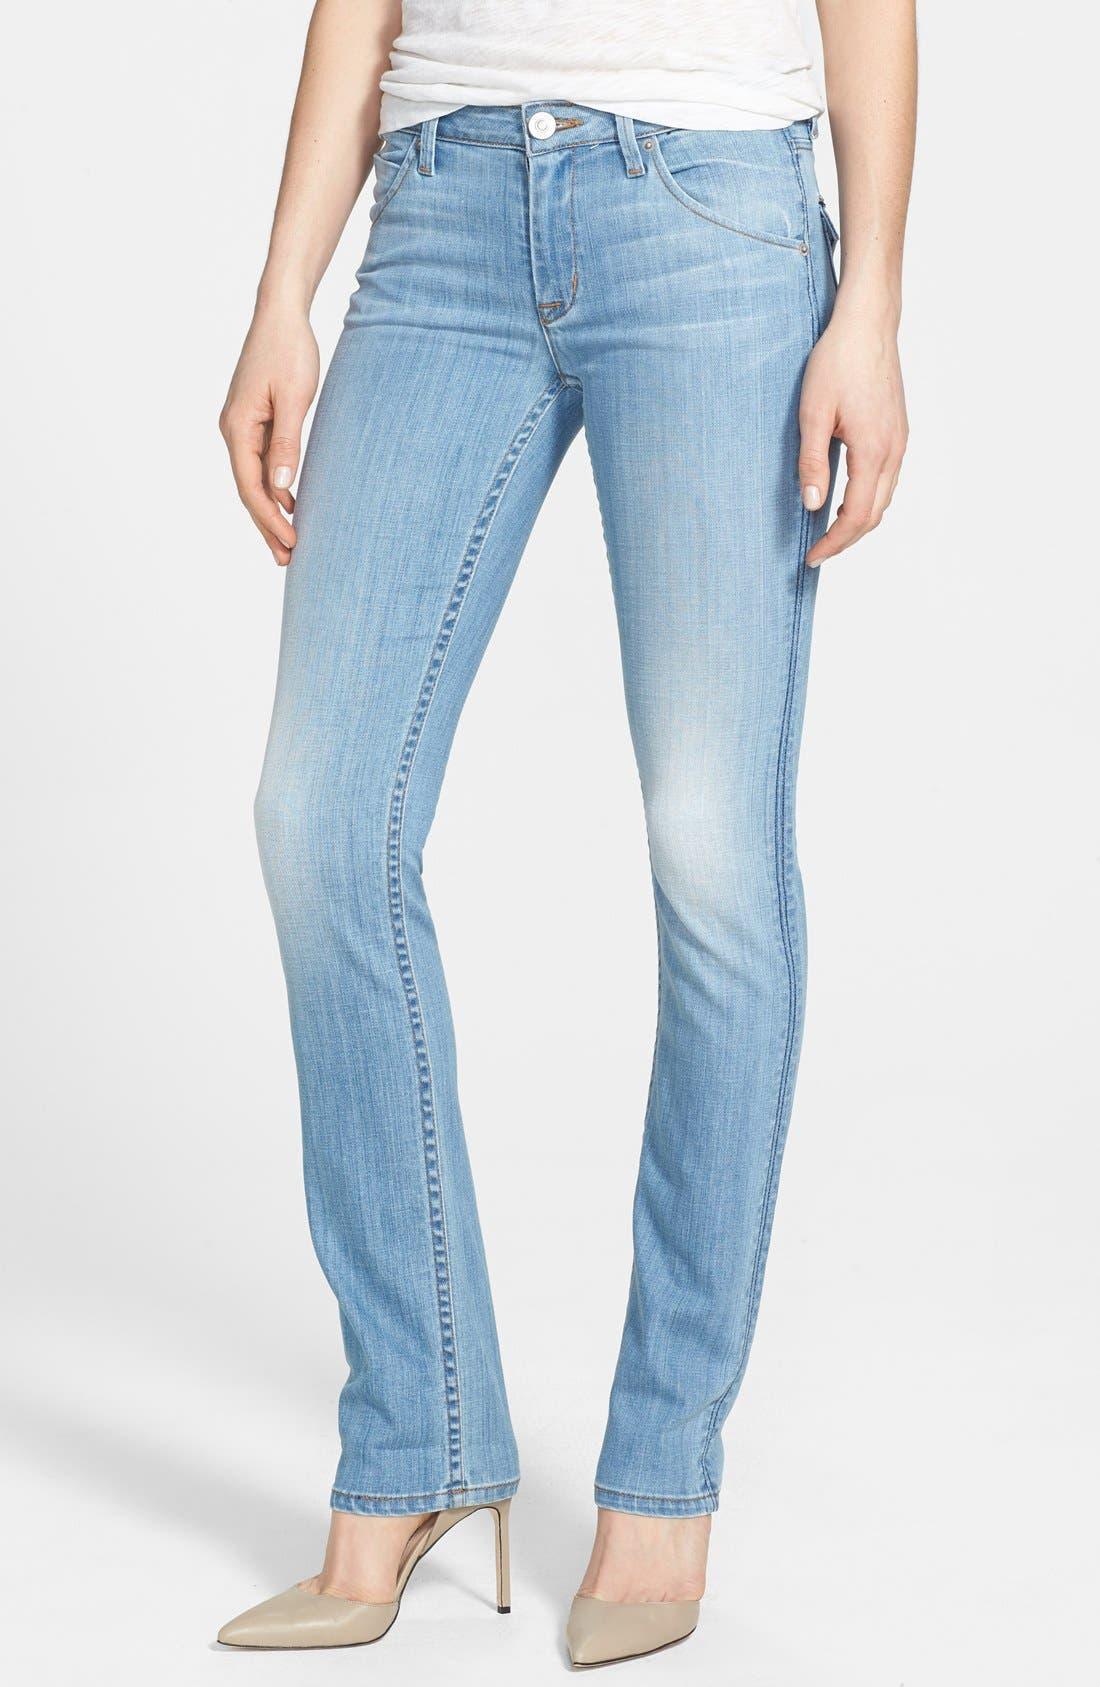 Main Image - Hudson Jeans 'Carly' Straight Leg Jeans (I Got Soul)